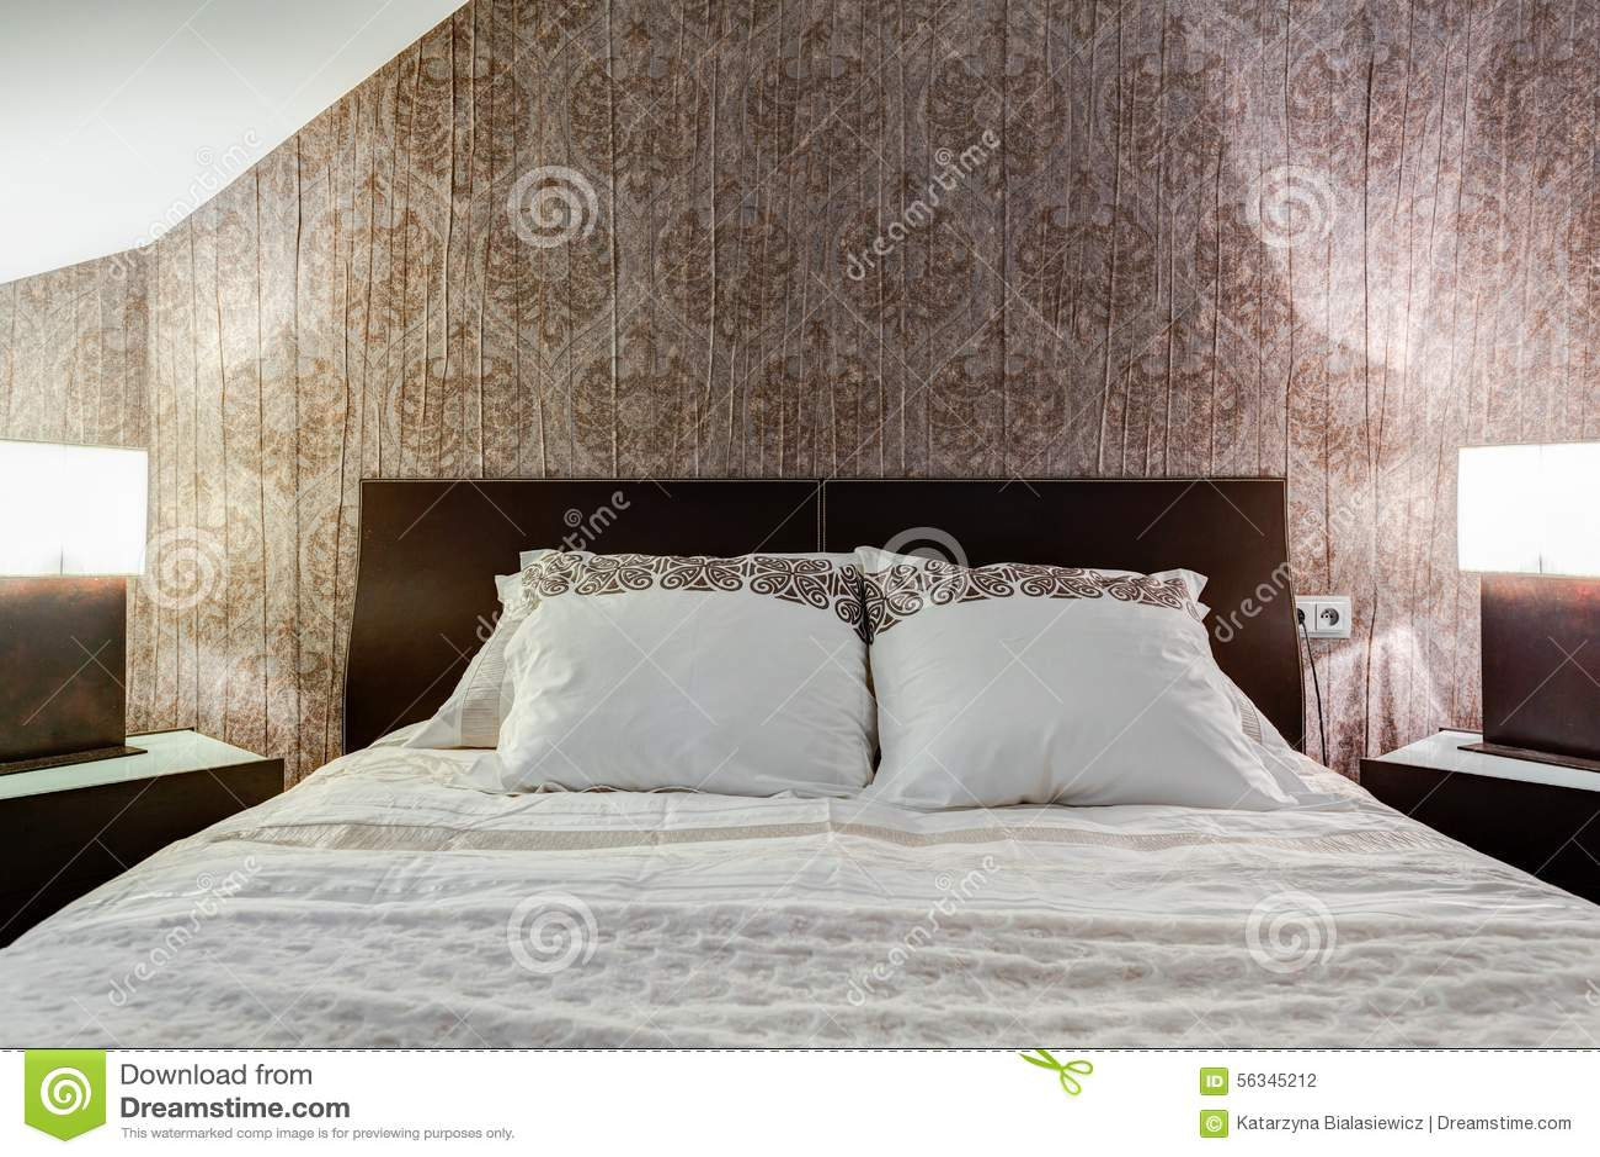 Modern Slaapkamer Behang : Bruin behang in elegante slaapkamer stock foto afbeelding